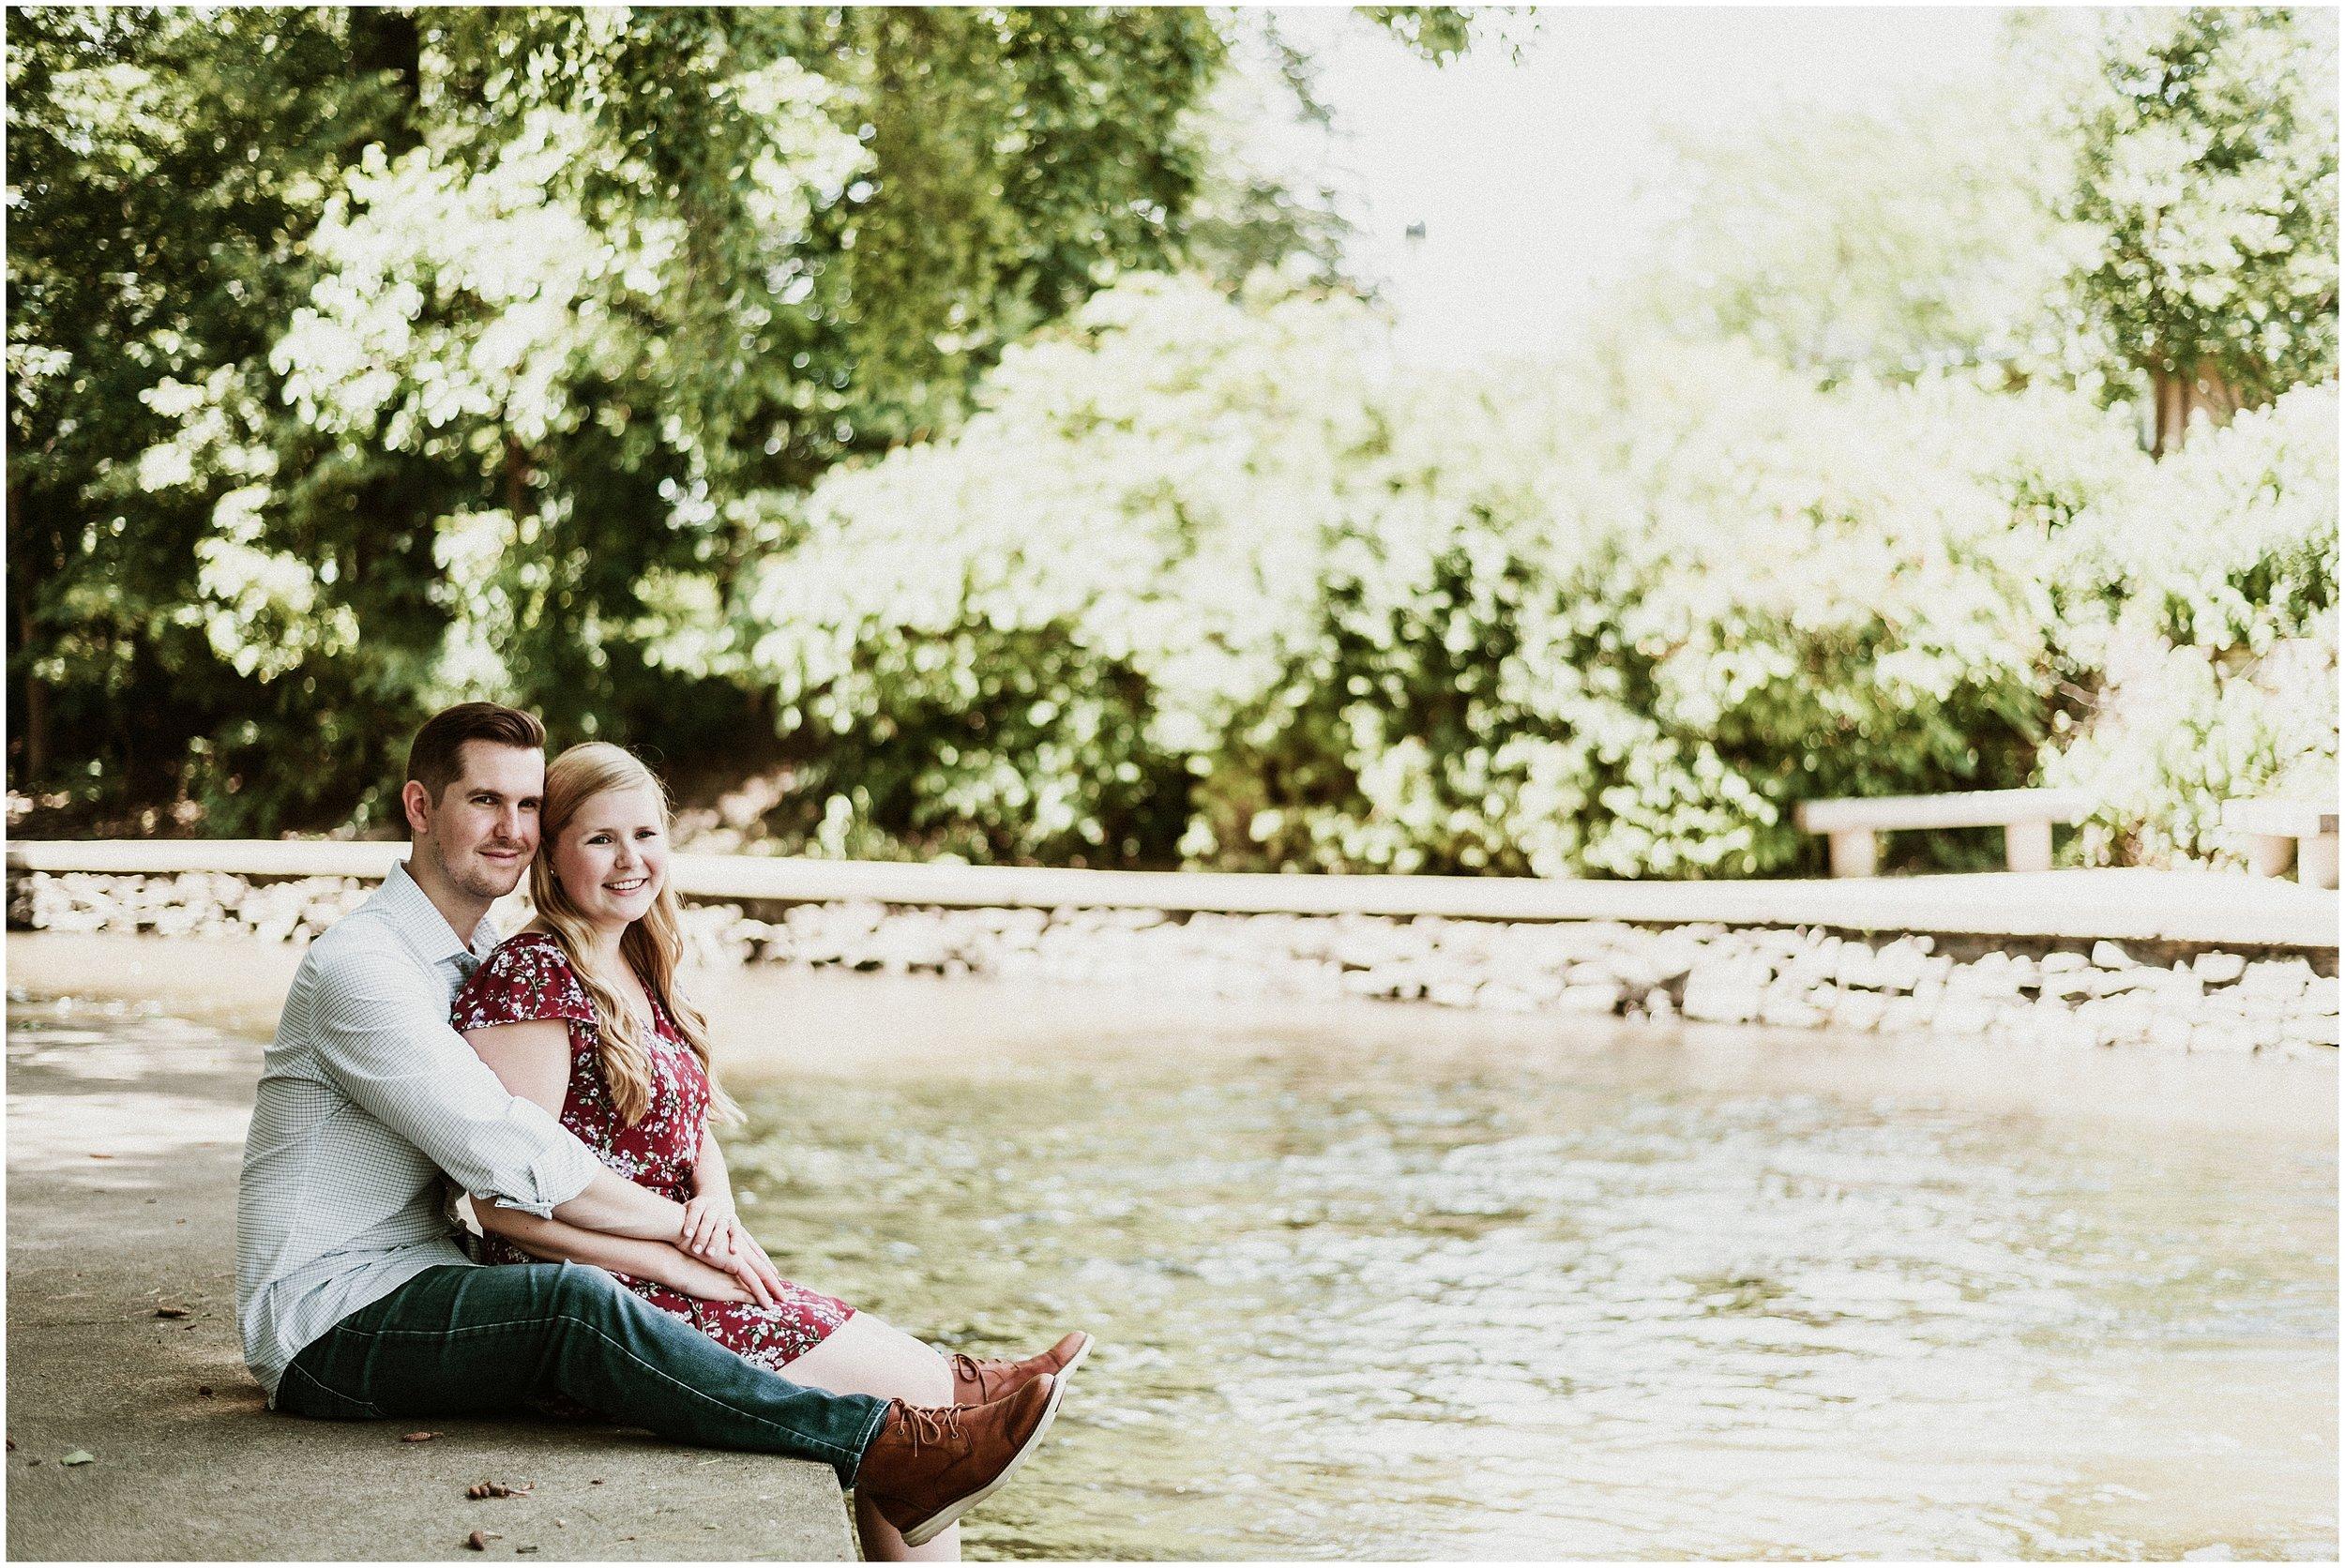 Emily and Brett | Hot Summer Days | Moser Tower & Naperville Riverwalk Engagement Session | Naperville, IL | Chicago Wedding Photogapher